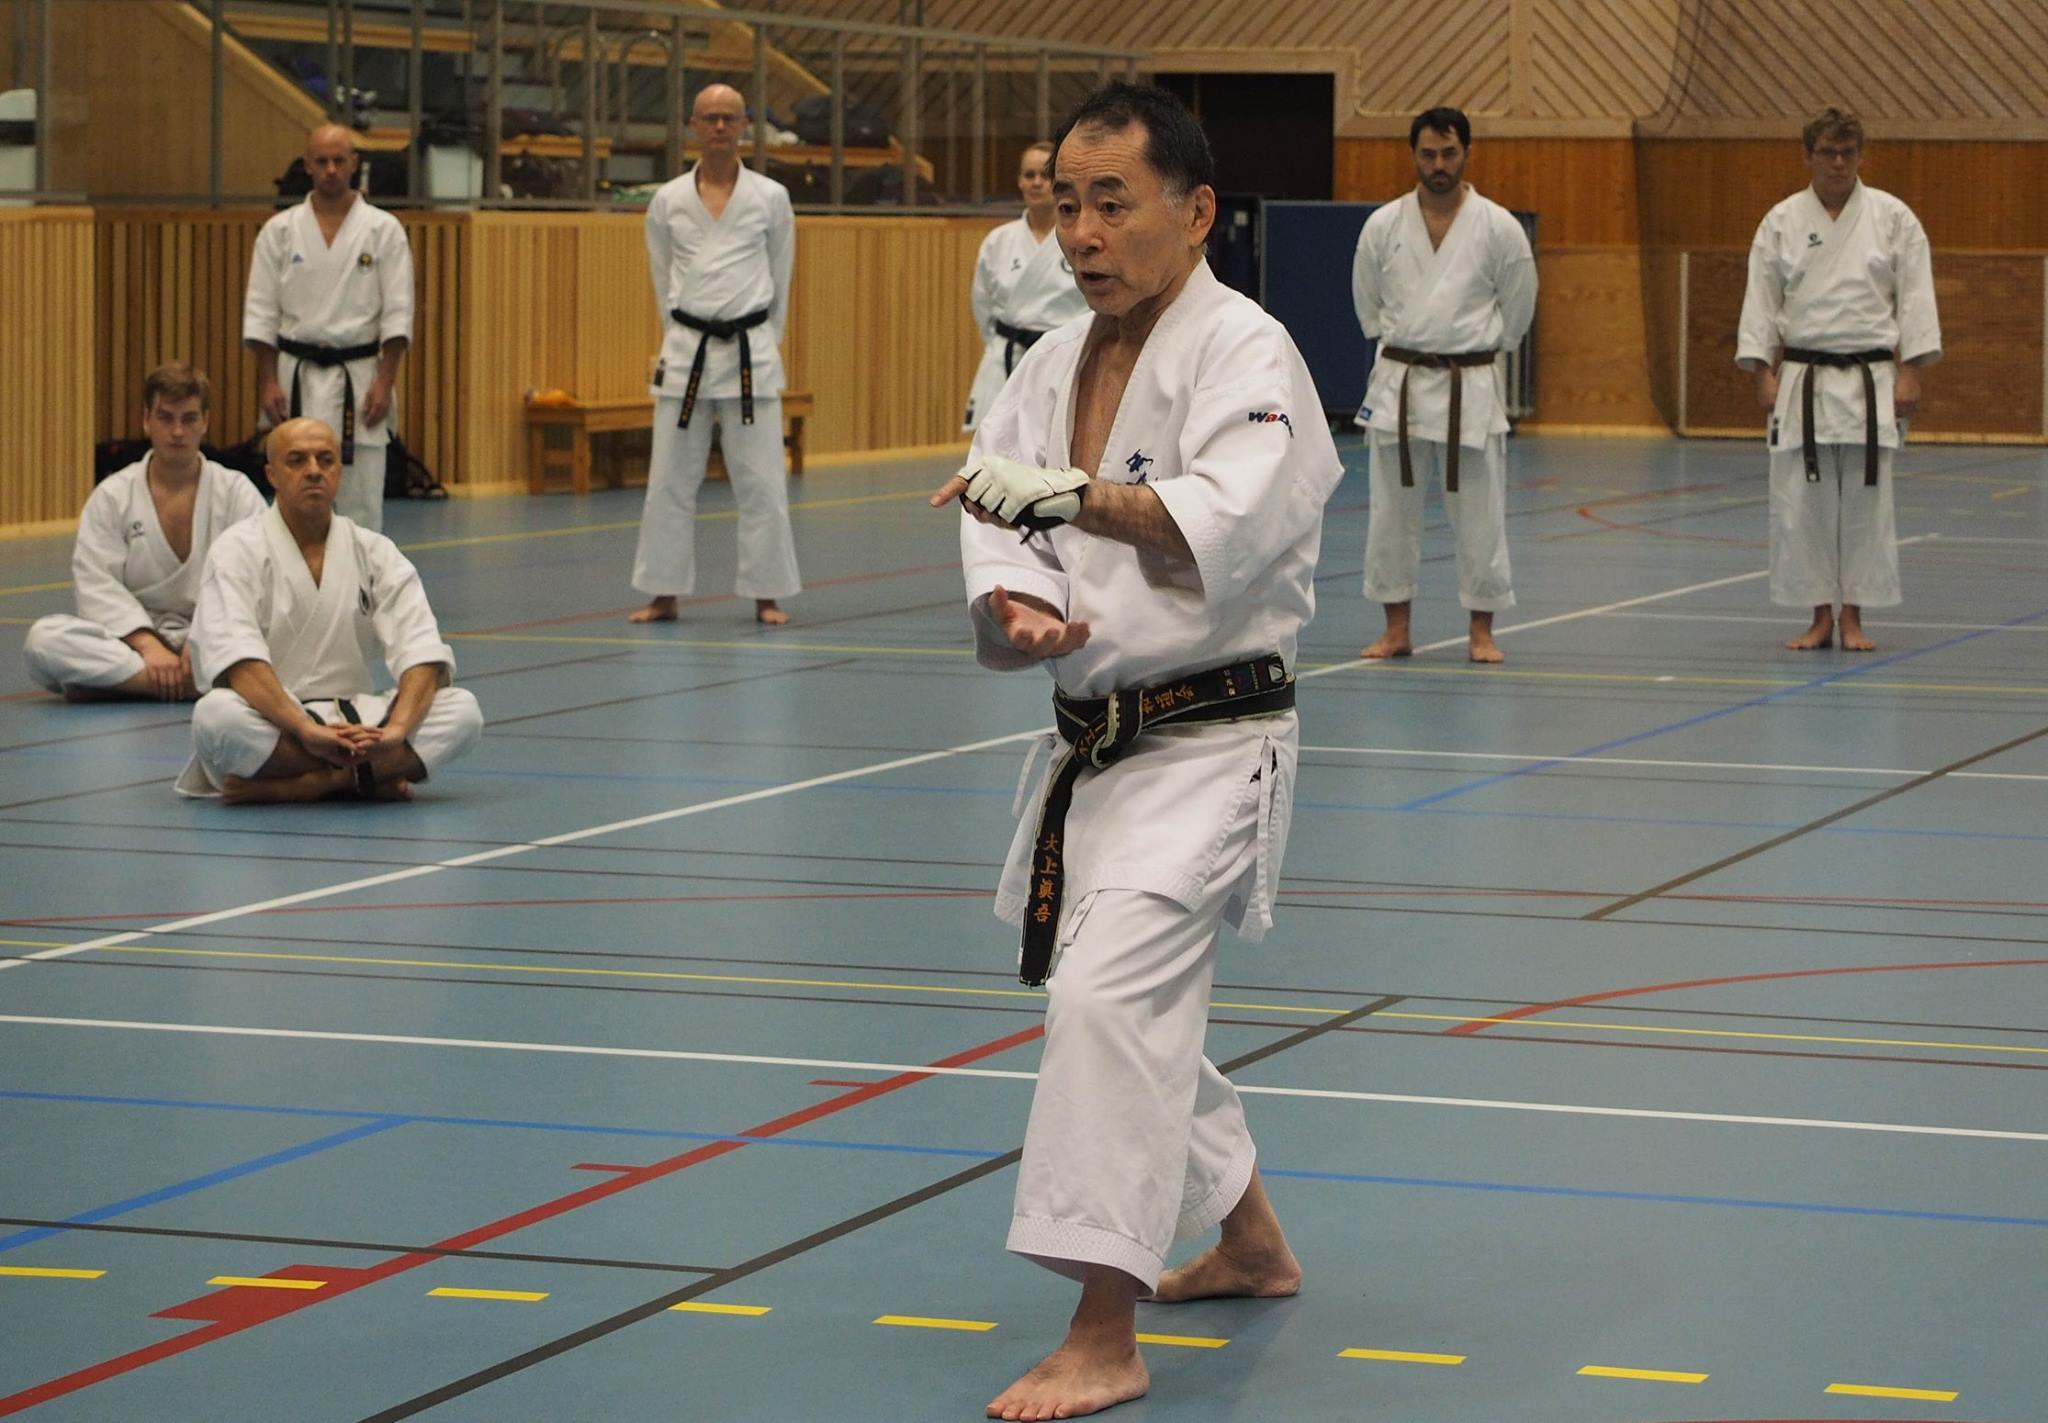 Shingo Ohgami, 8th dan JKF Wadokai, passed away